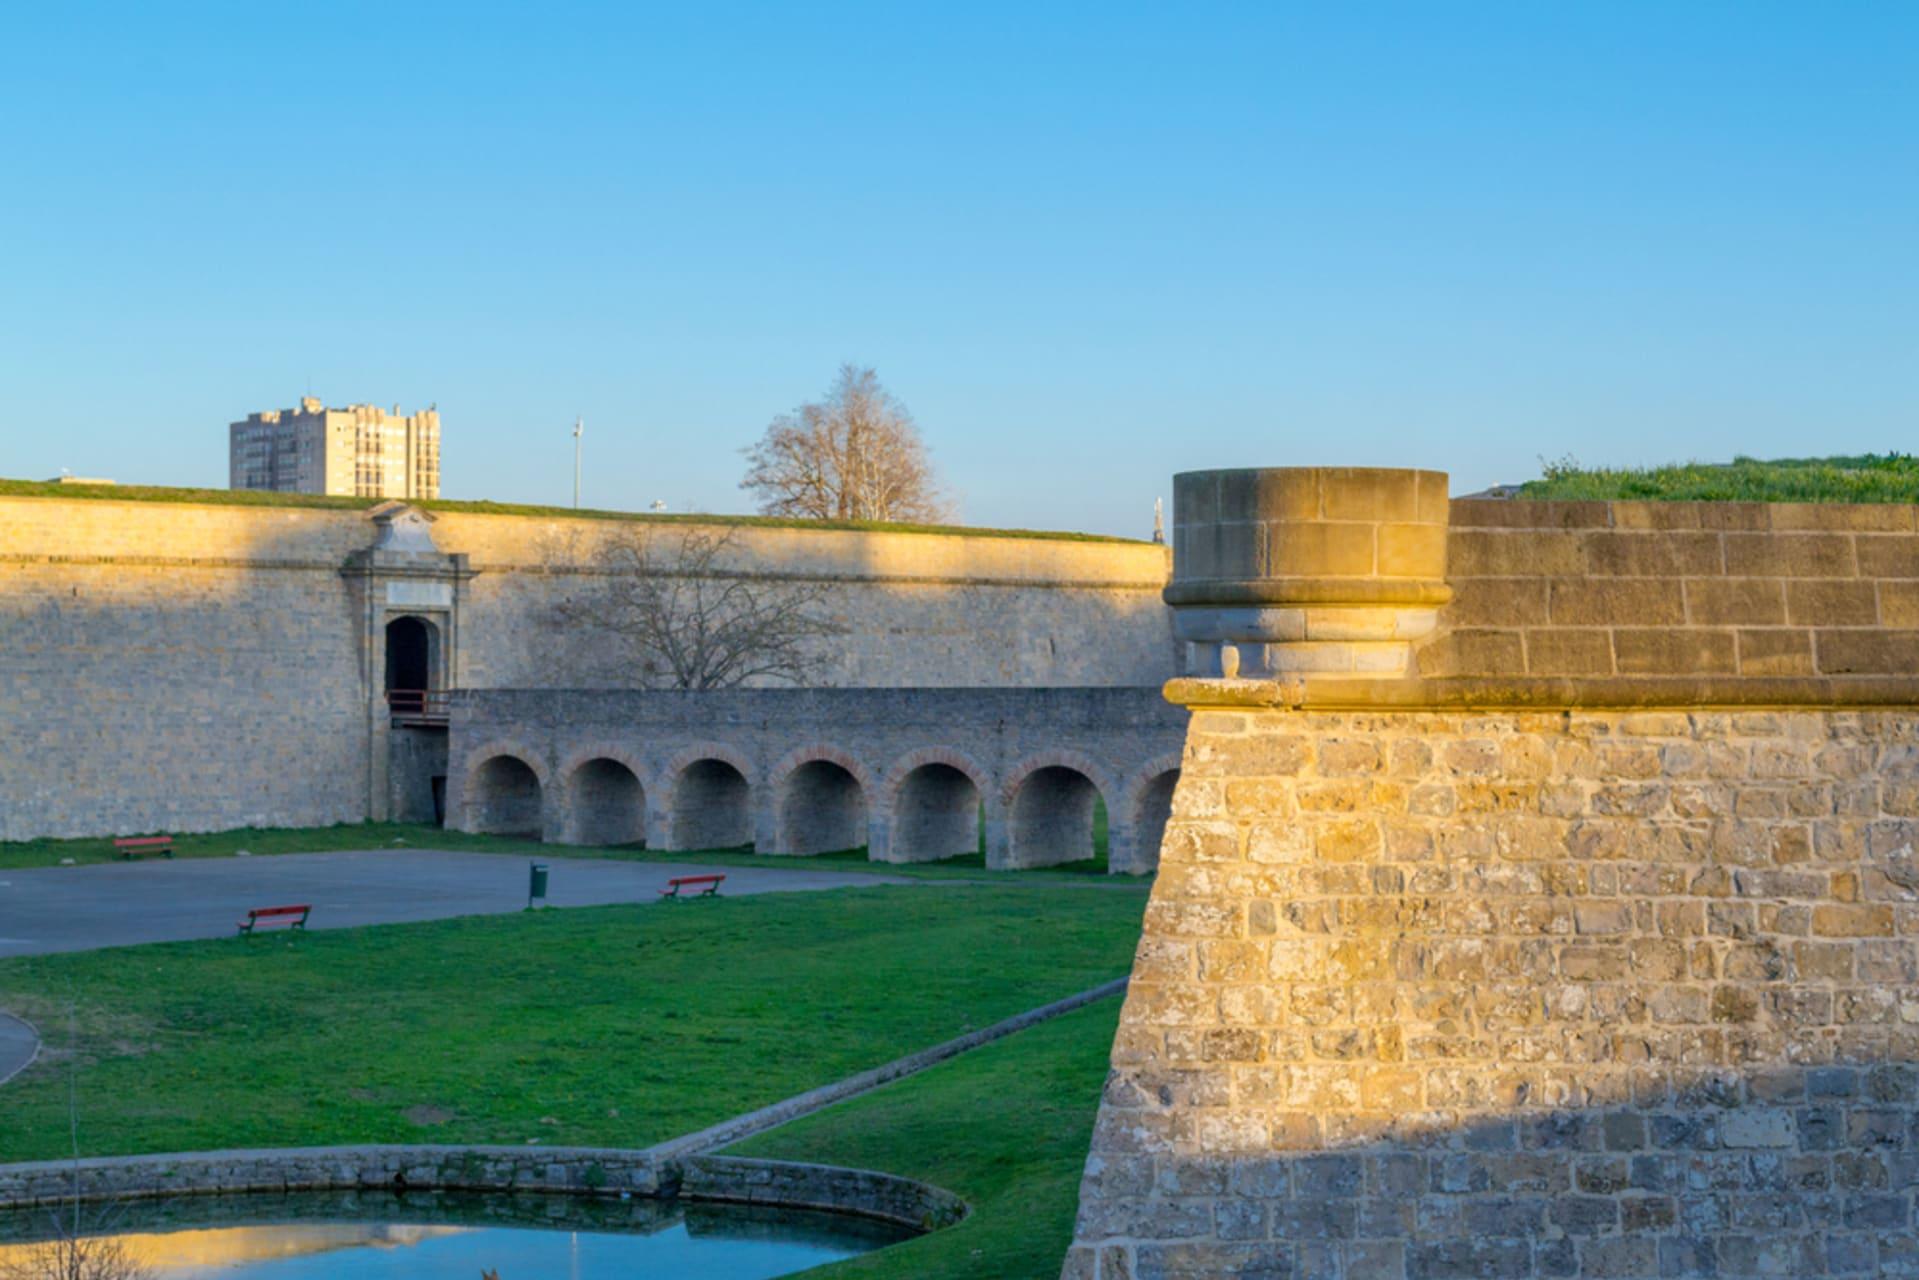 Pamplona - Pamplona's Citadel is Spanish Troy horse